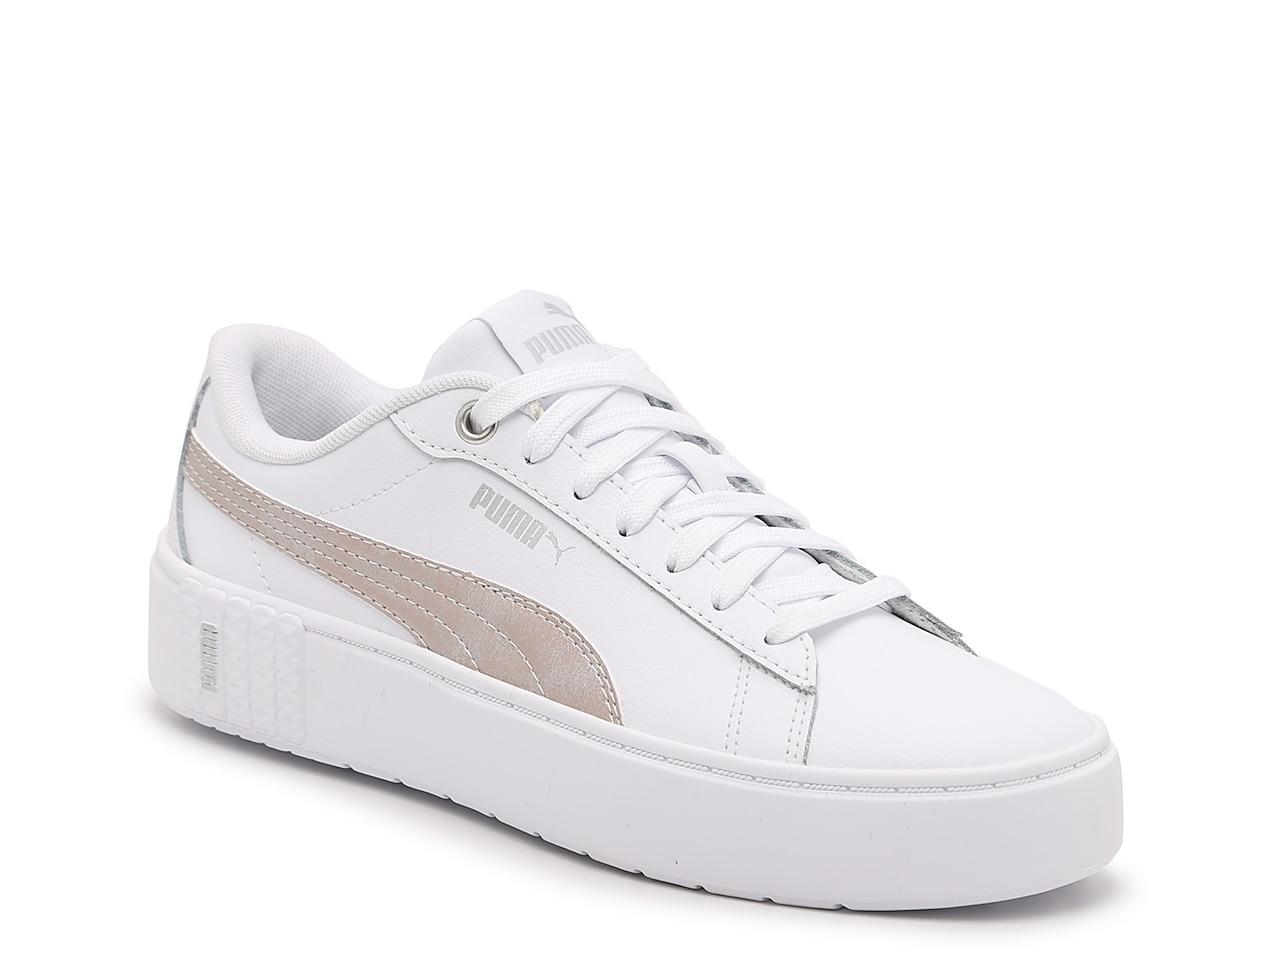 Puma Smash v2 Platform Sneaker - Women's